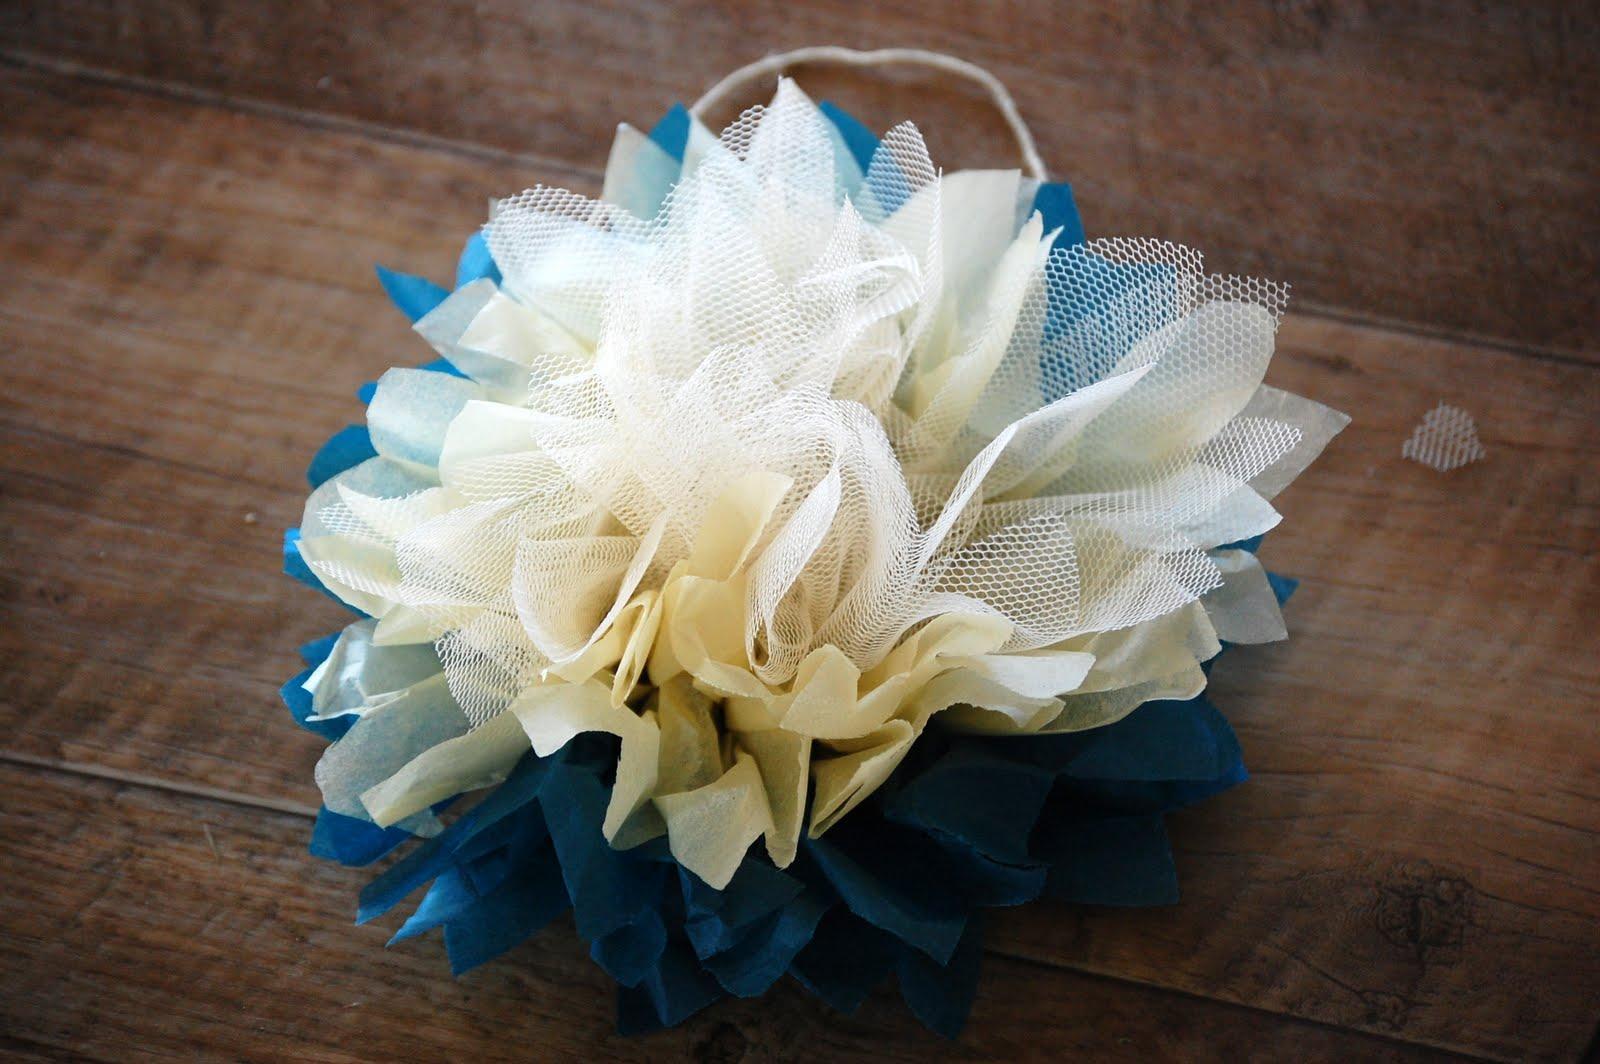 como fazer pompom papel de seda tule decoracao festa aniversario batizado casamento cha de bebe (7)